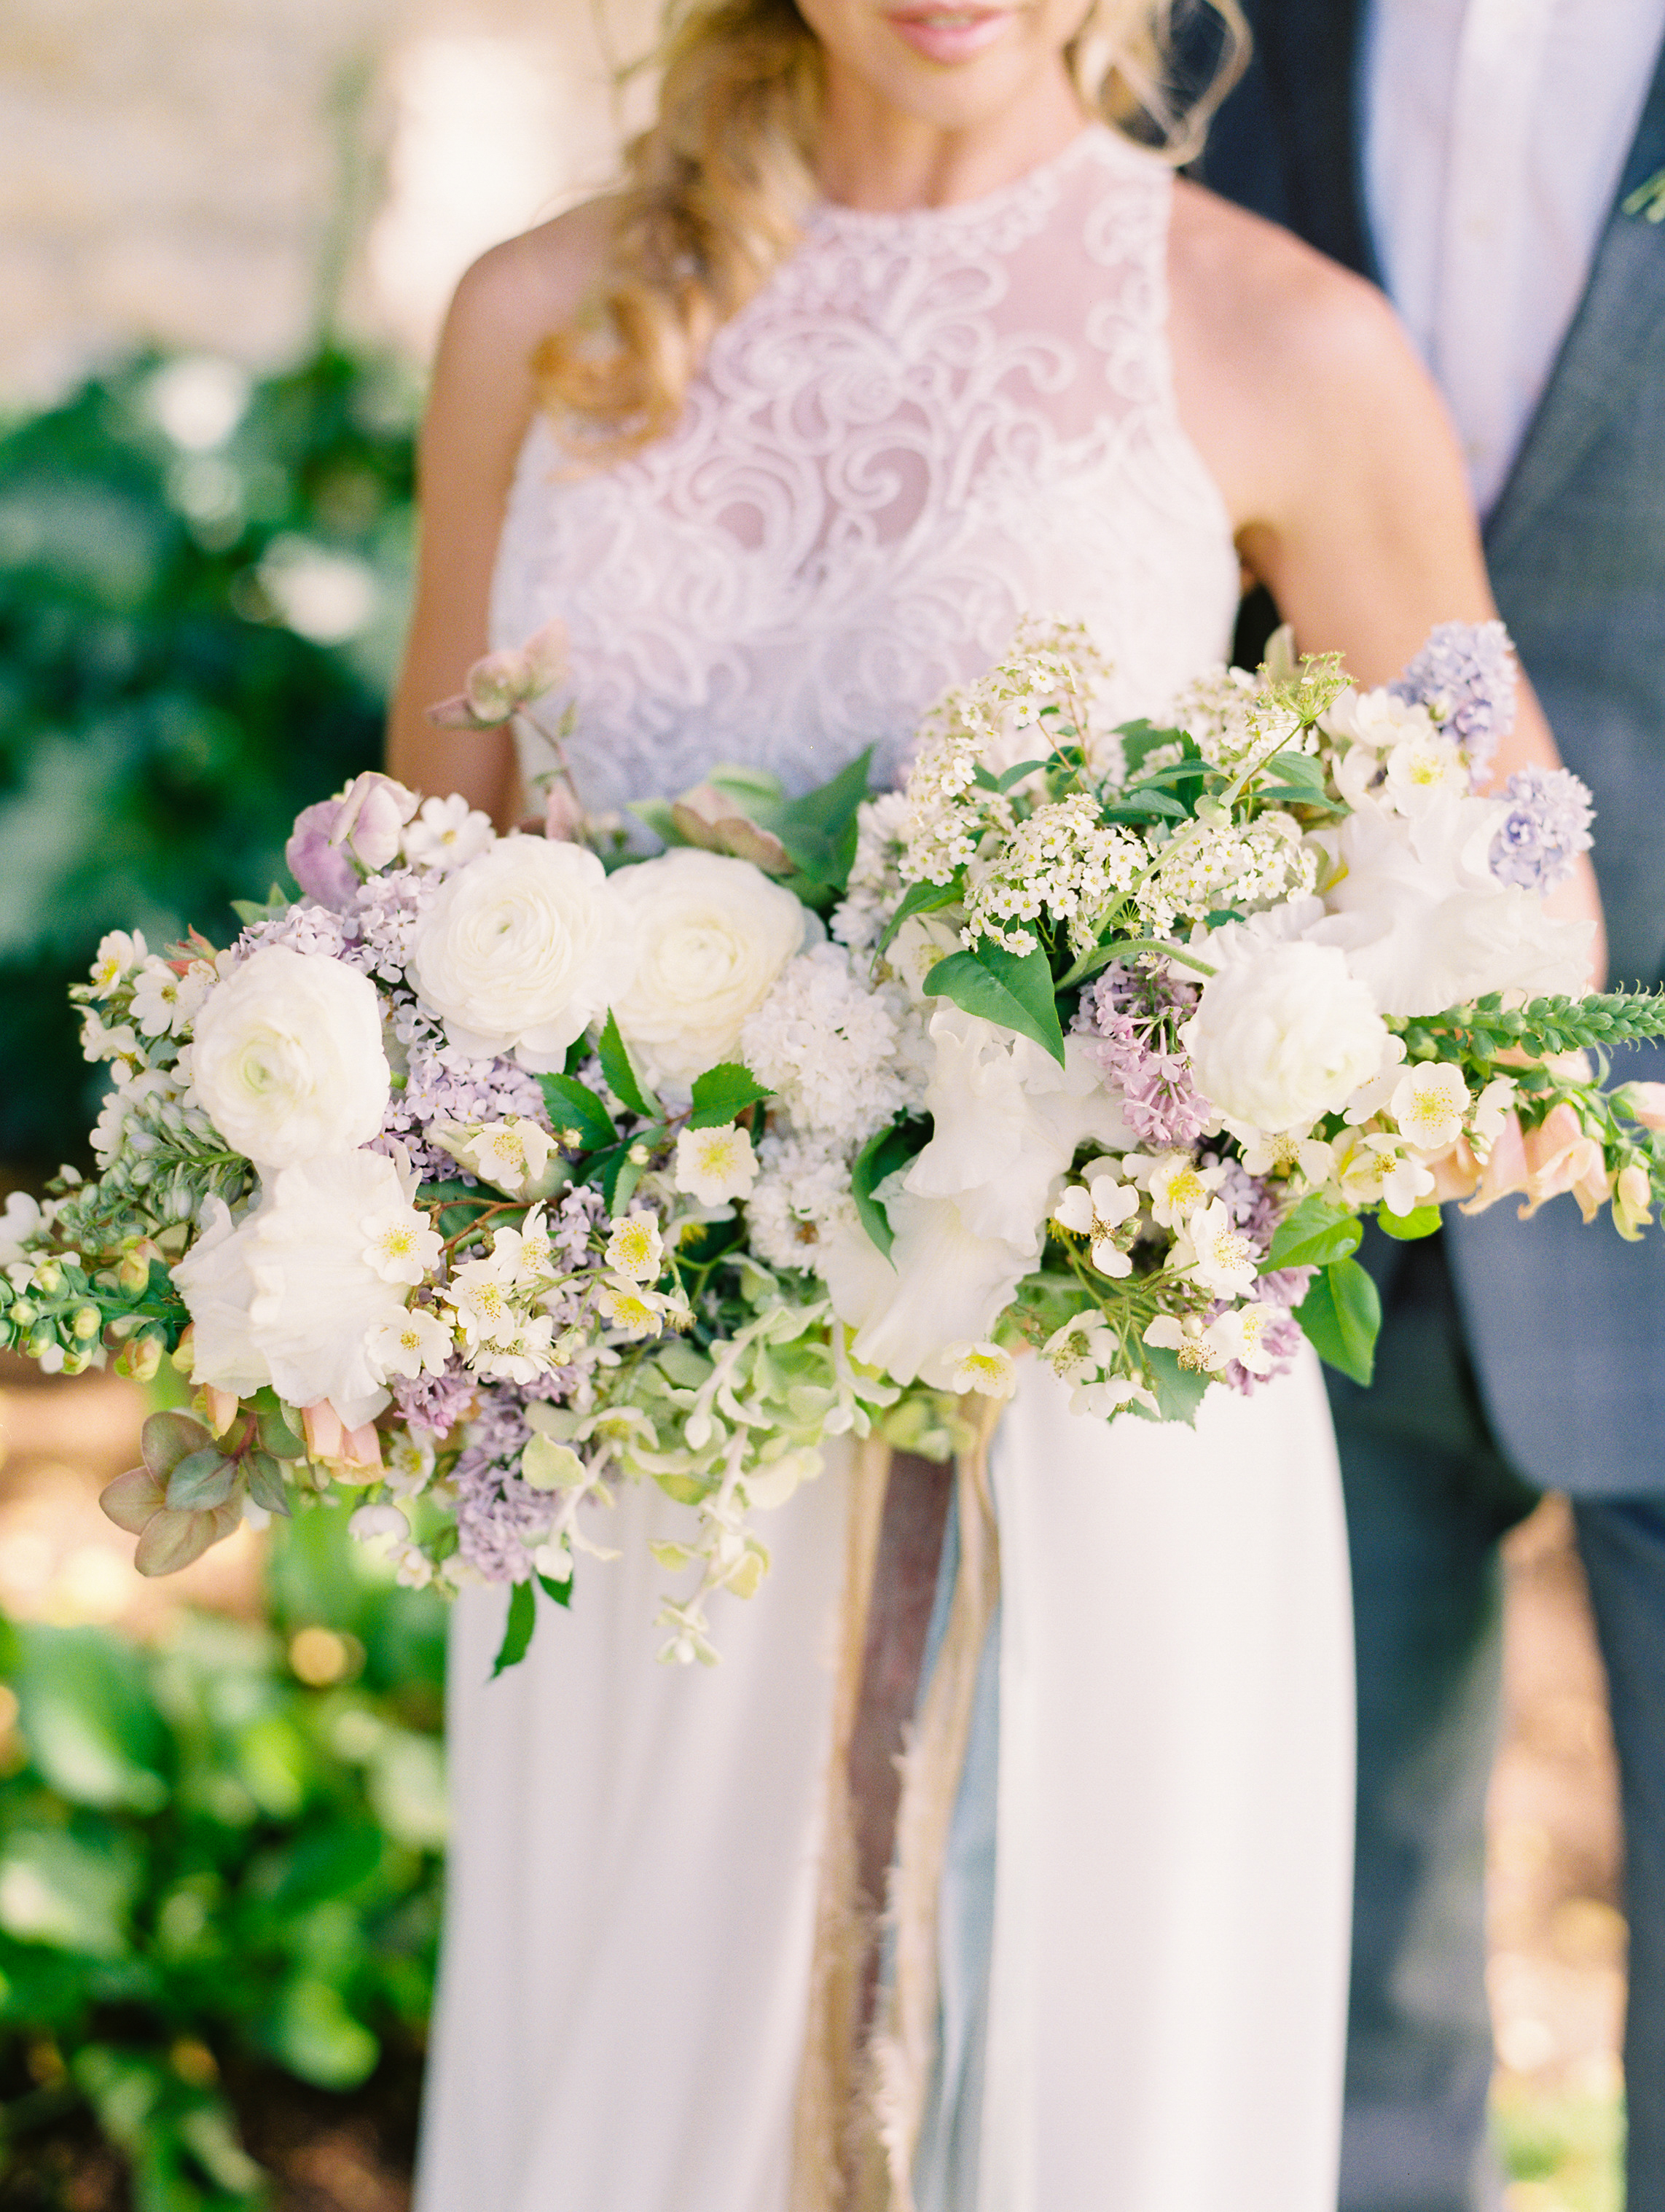 holman+ranch+wedding+bloom+workshop-48.jpg